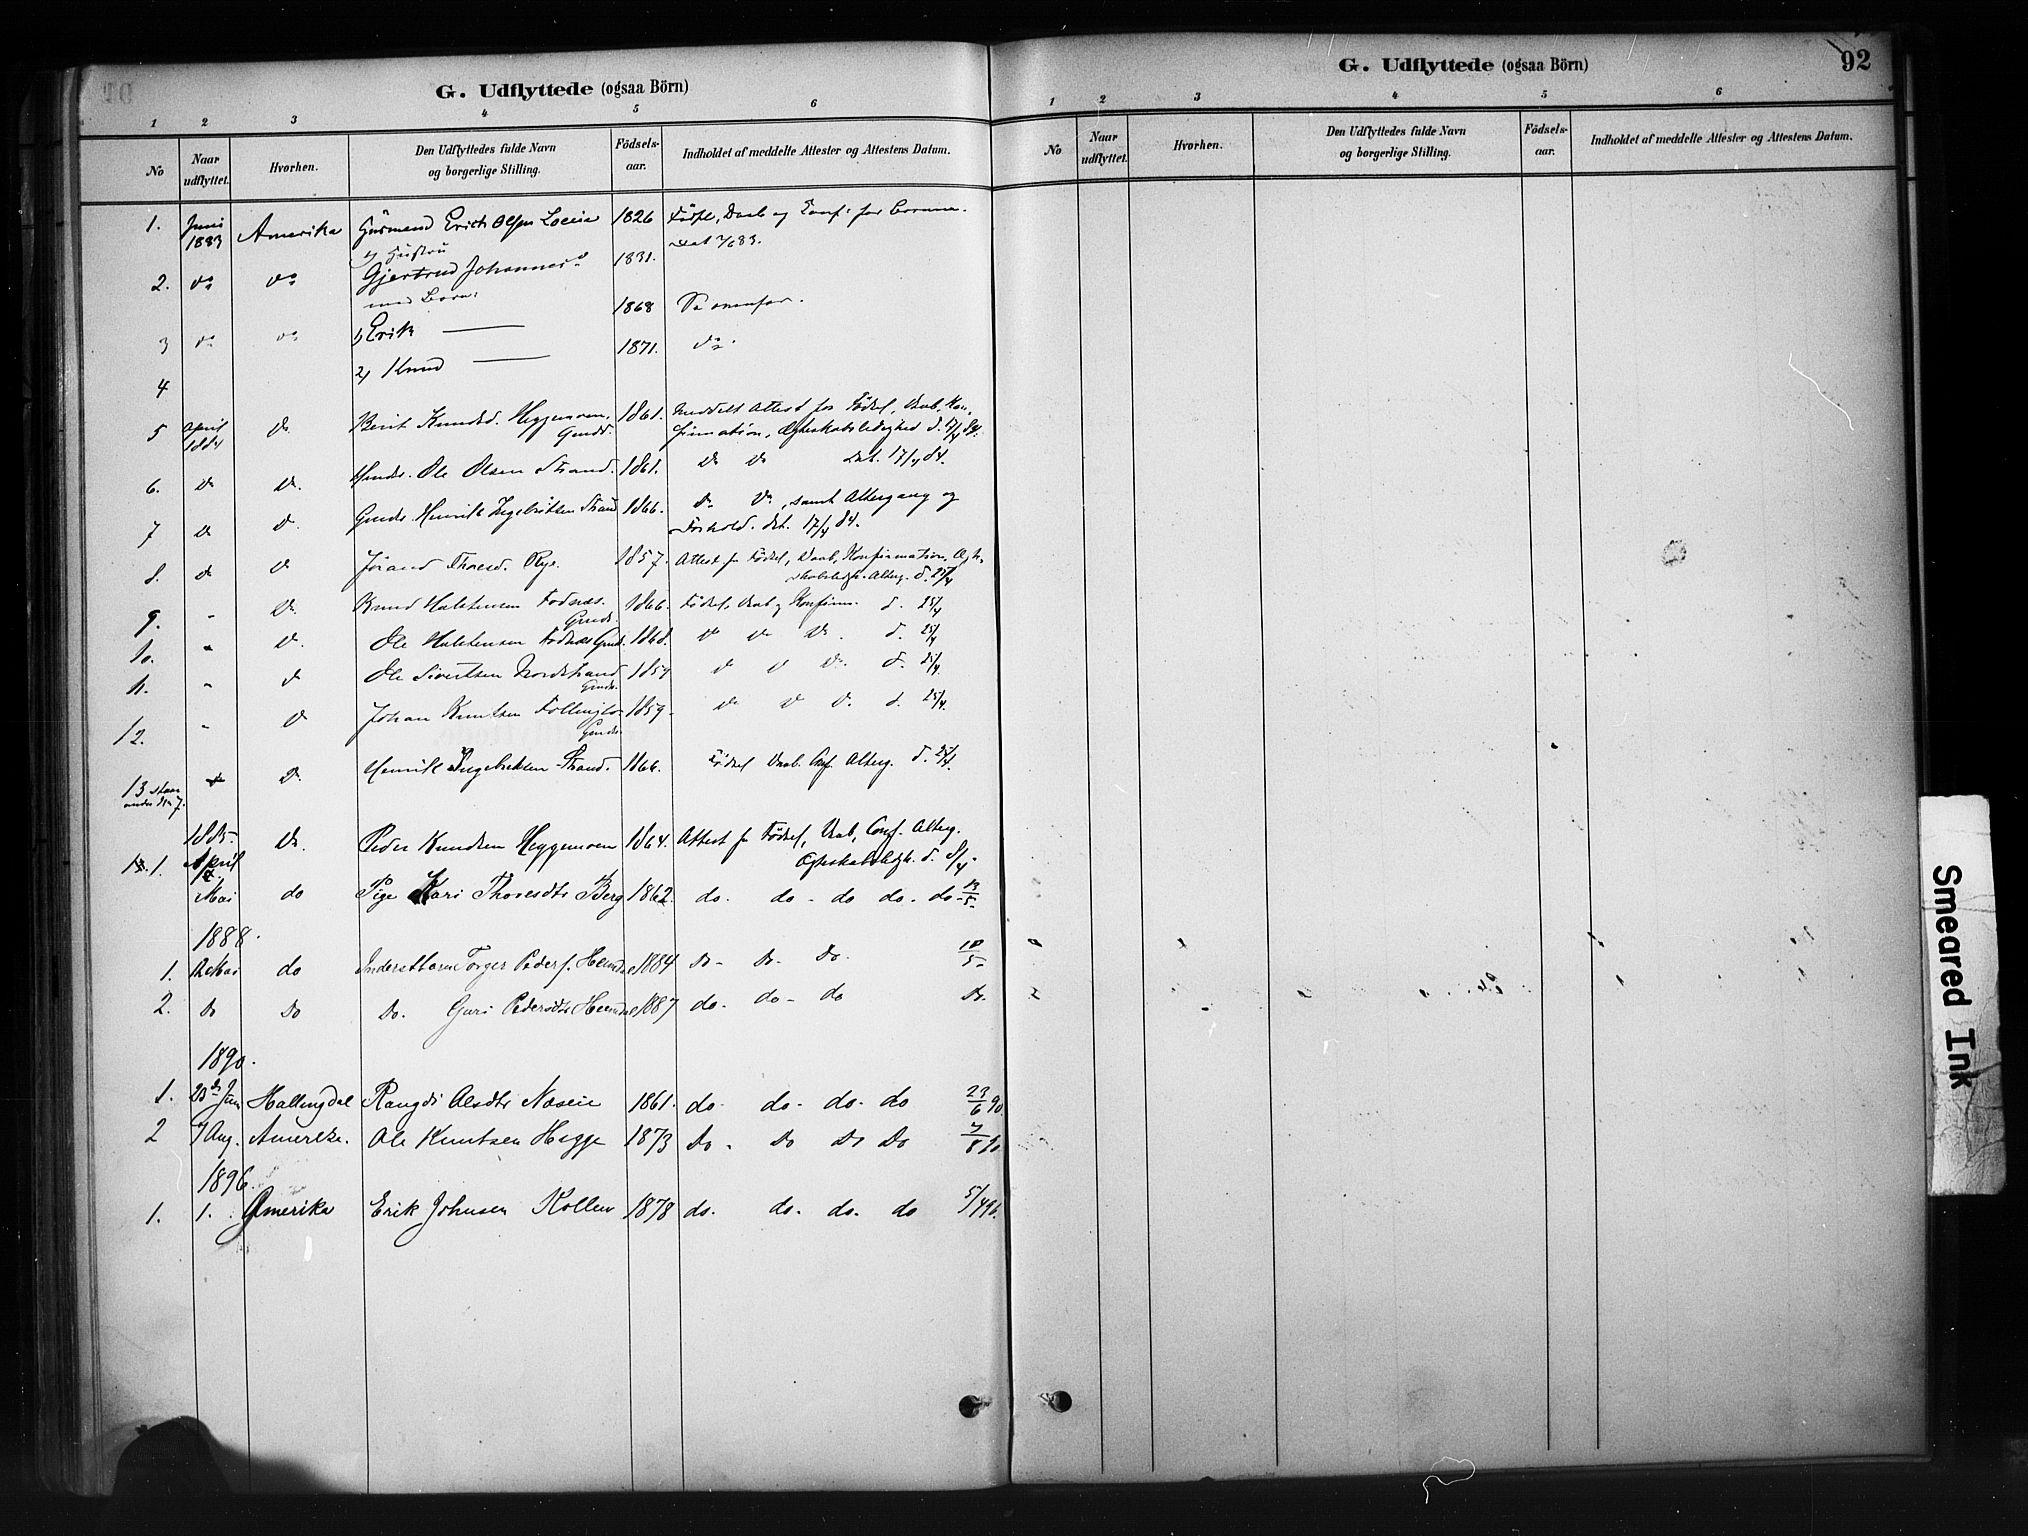 SAH, Nord-Aurdal prestekontor, Ministerialbok nr. 10, 1883-1896, s. 92